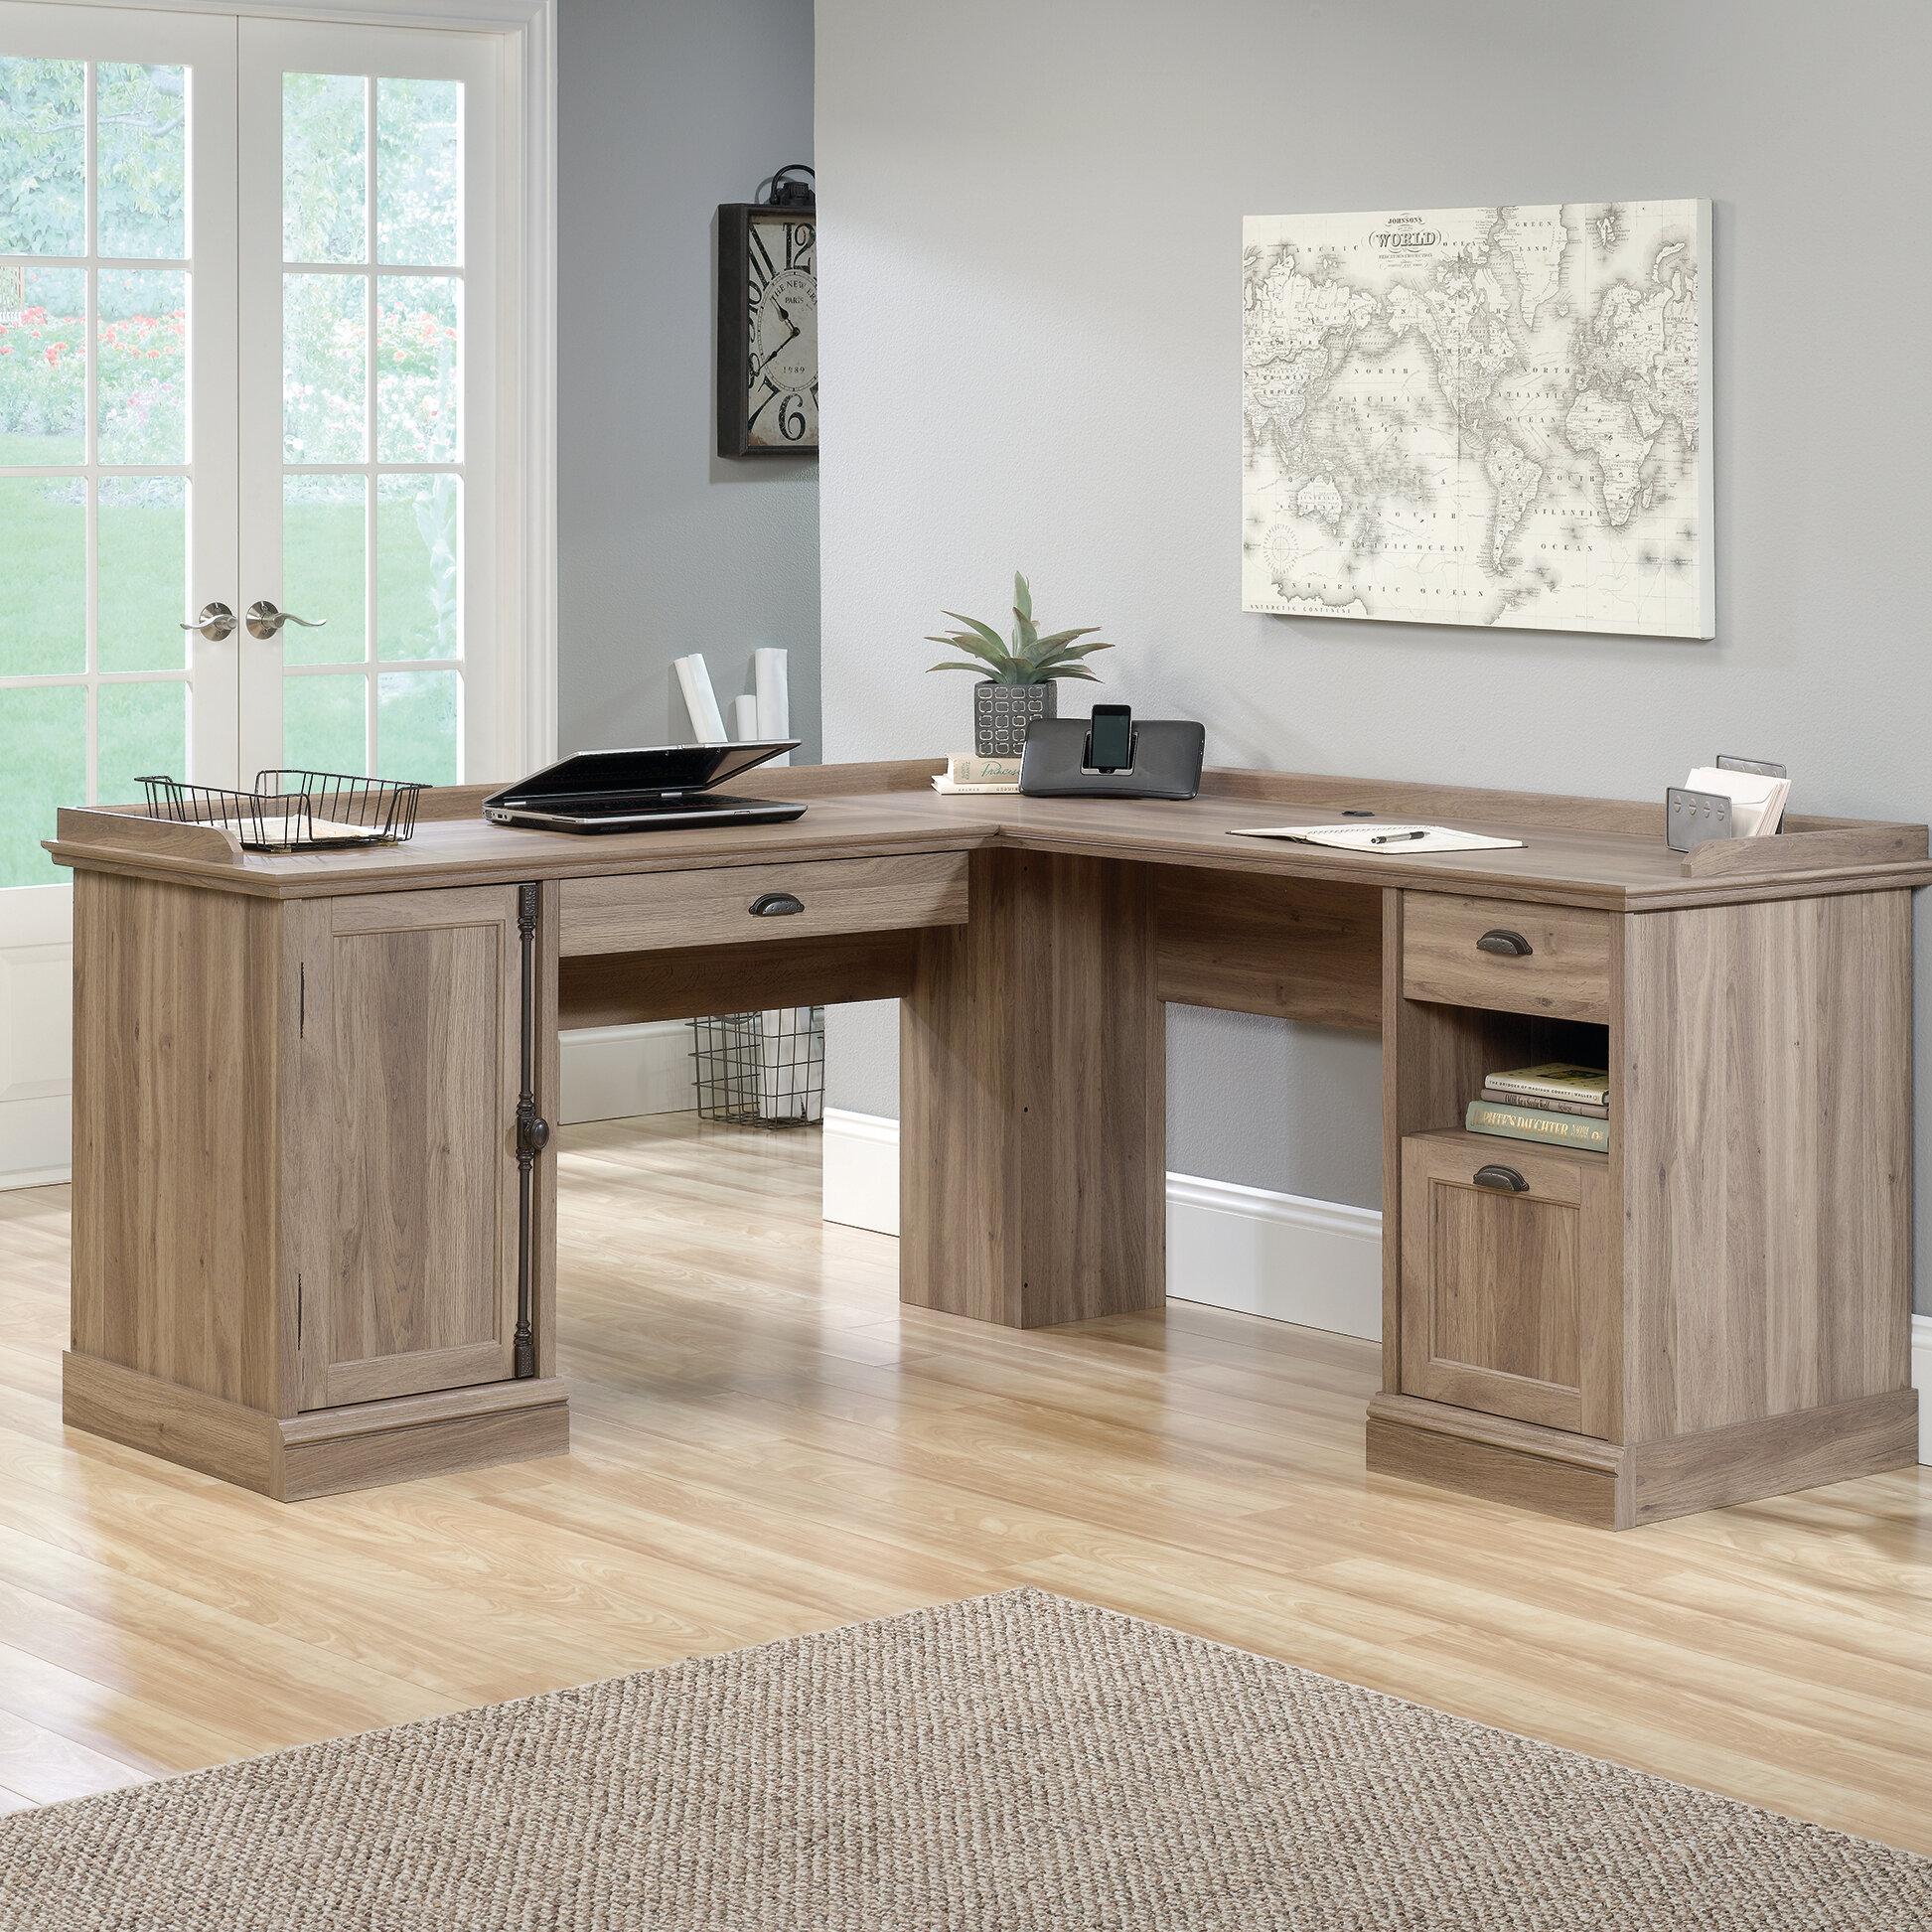 office deskd. Bowerbank L-Shaped Executive Desk Office Deskd